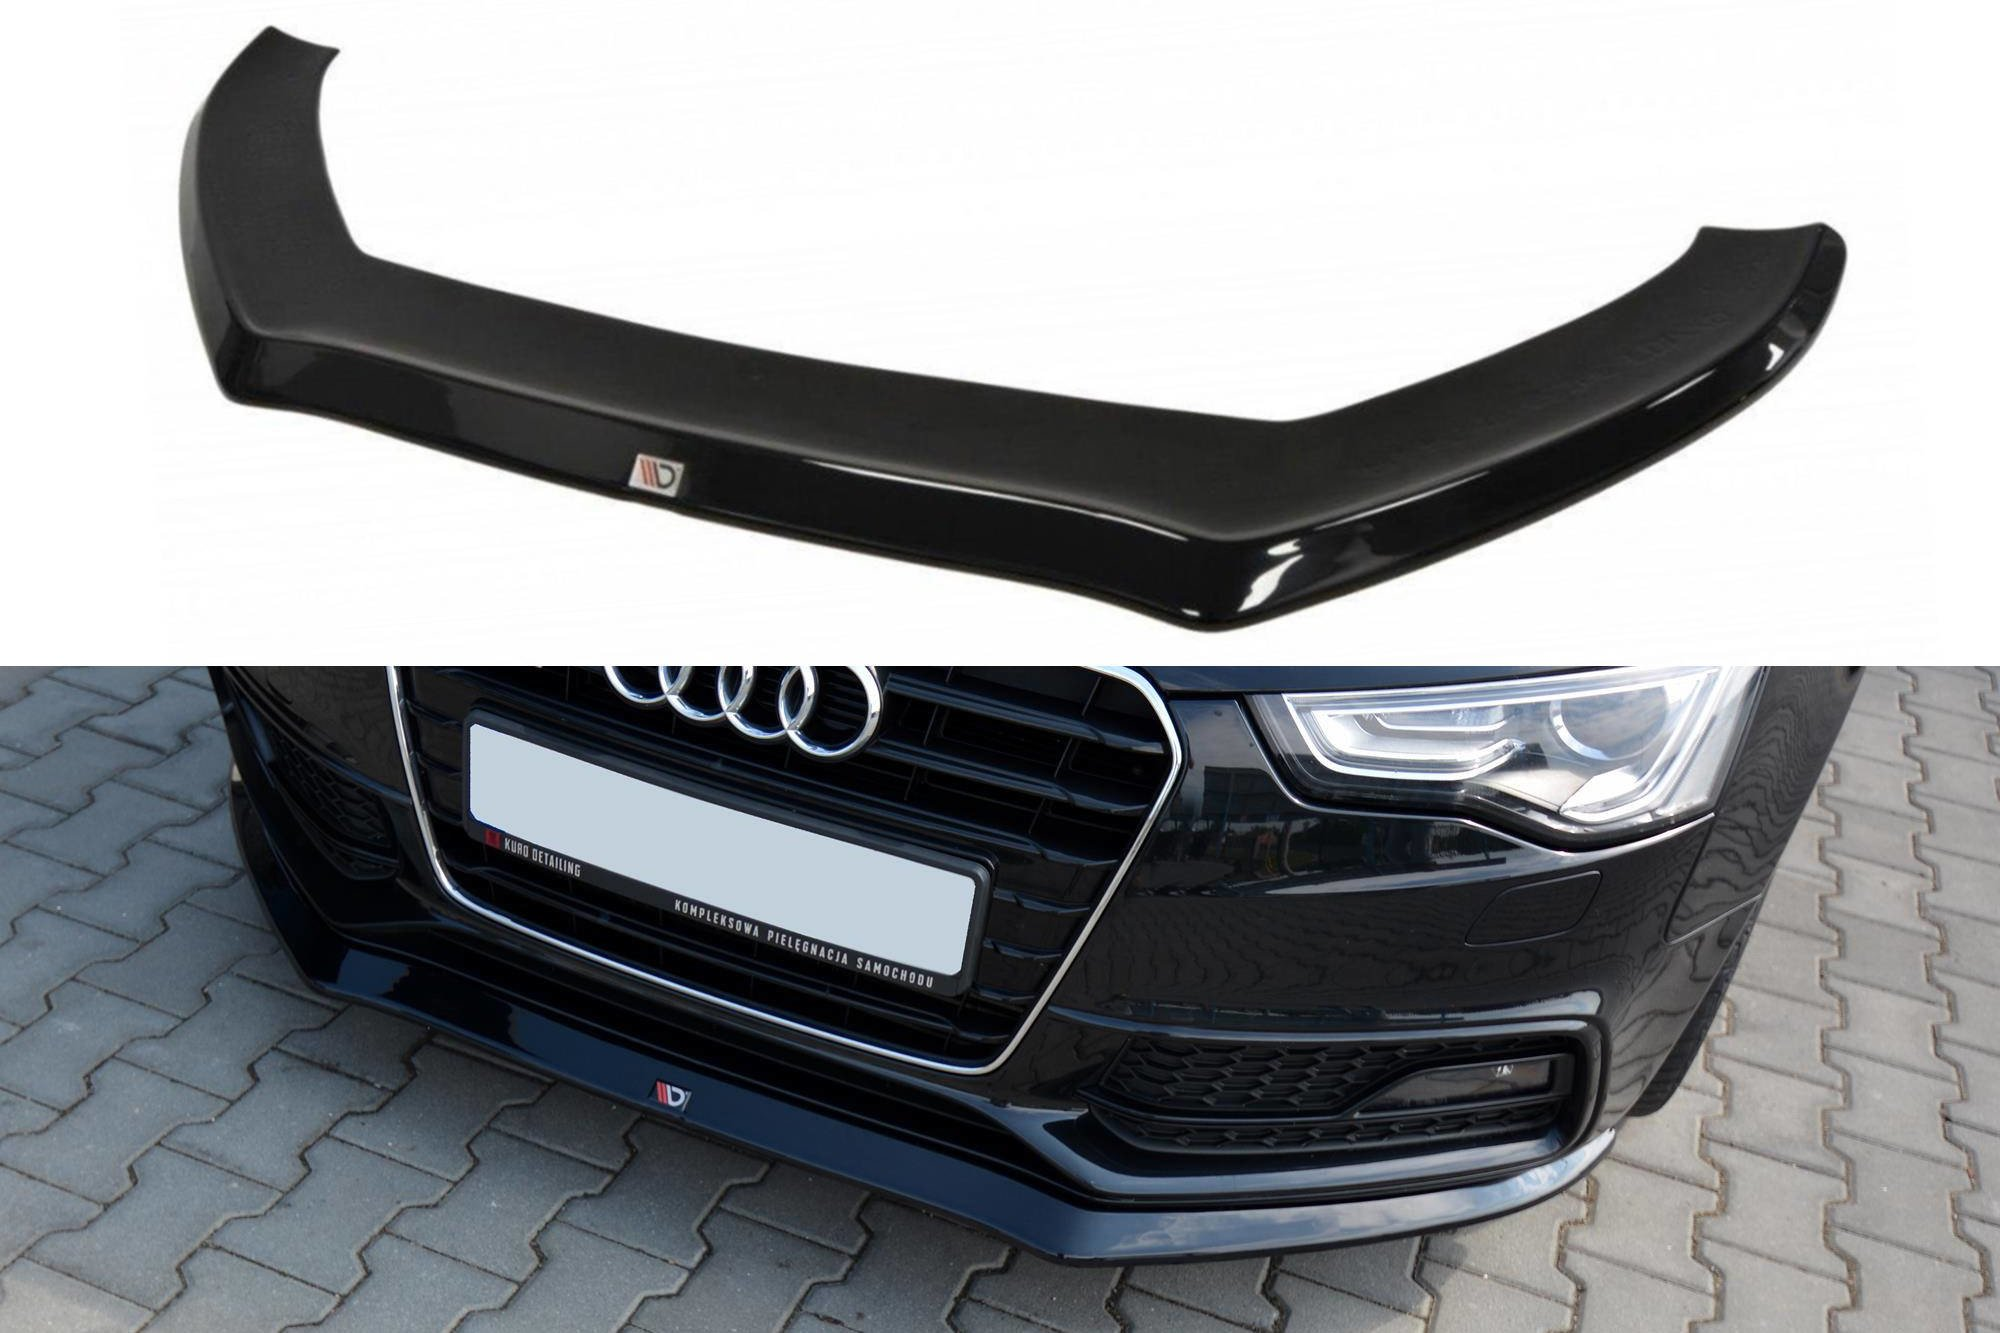 Front Splitter V 1 Audi S5 A5 S Line 8t Fl Our Offer Audi A5 S5 Rs5 A5 S Line 8t Fl 2011 2016 Coupe Our Offer